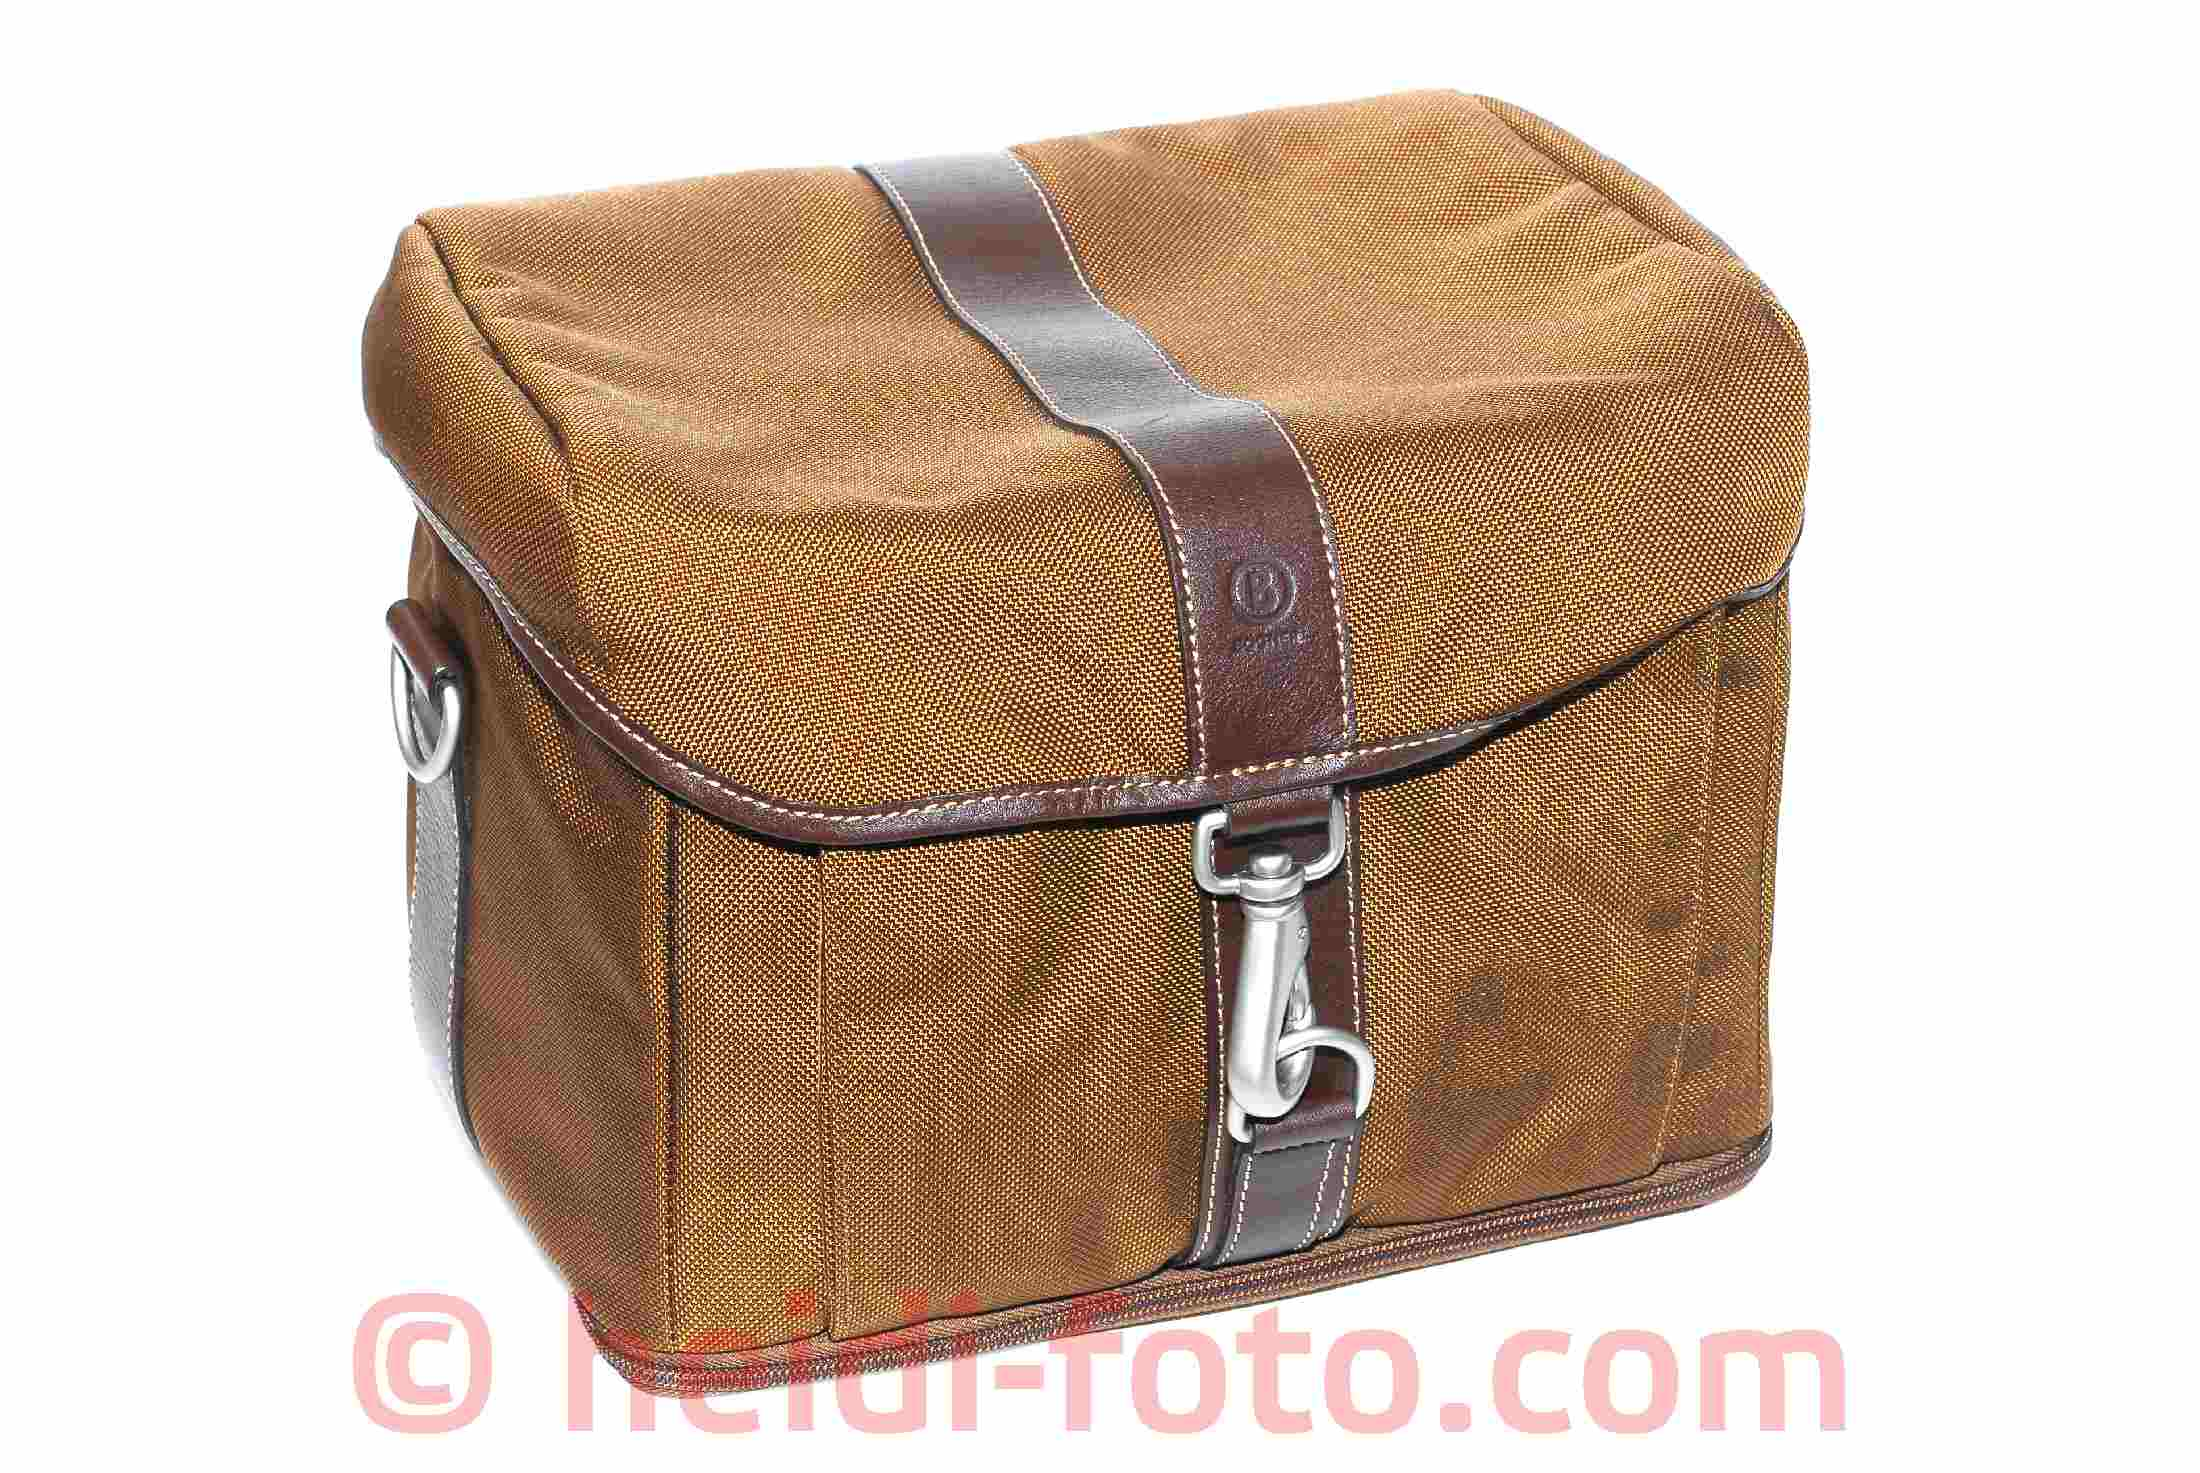 Bogner Fototasche Kamera-Tasche Elba 30x23x25 wie neu -excellent like new